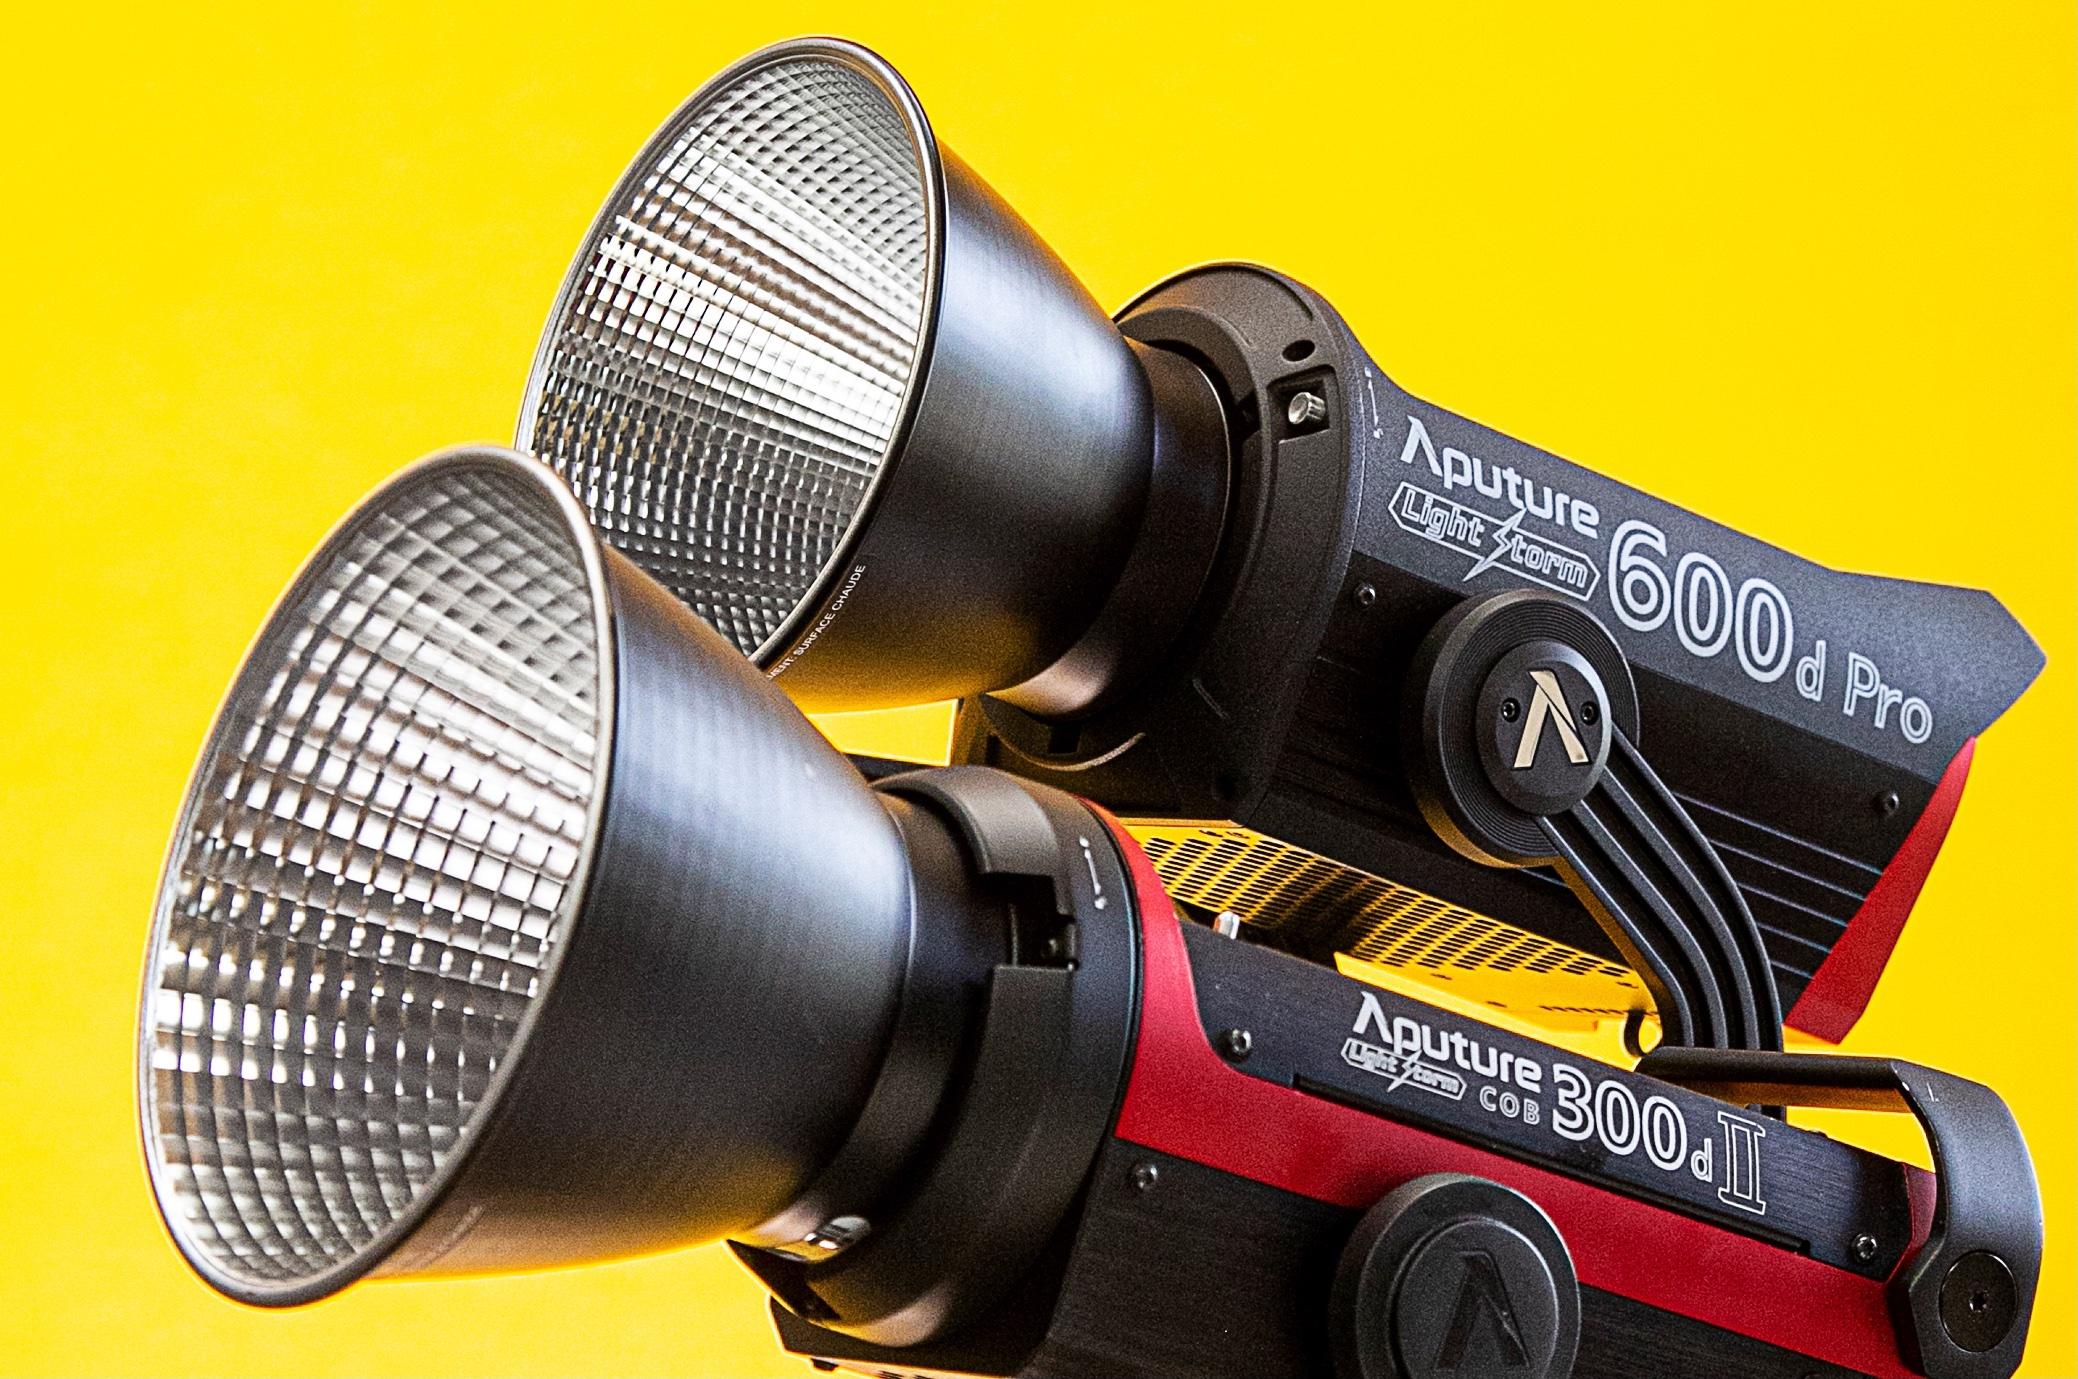 Film Grip and Lighting Equipment